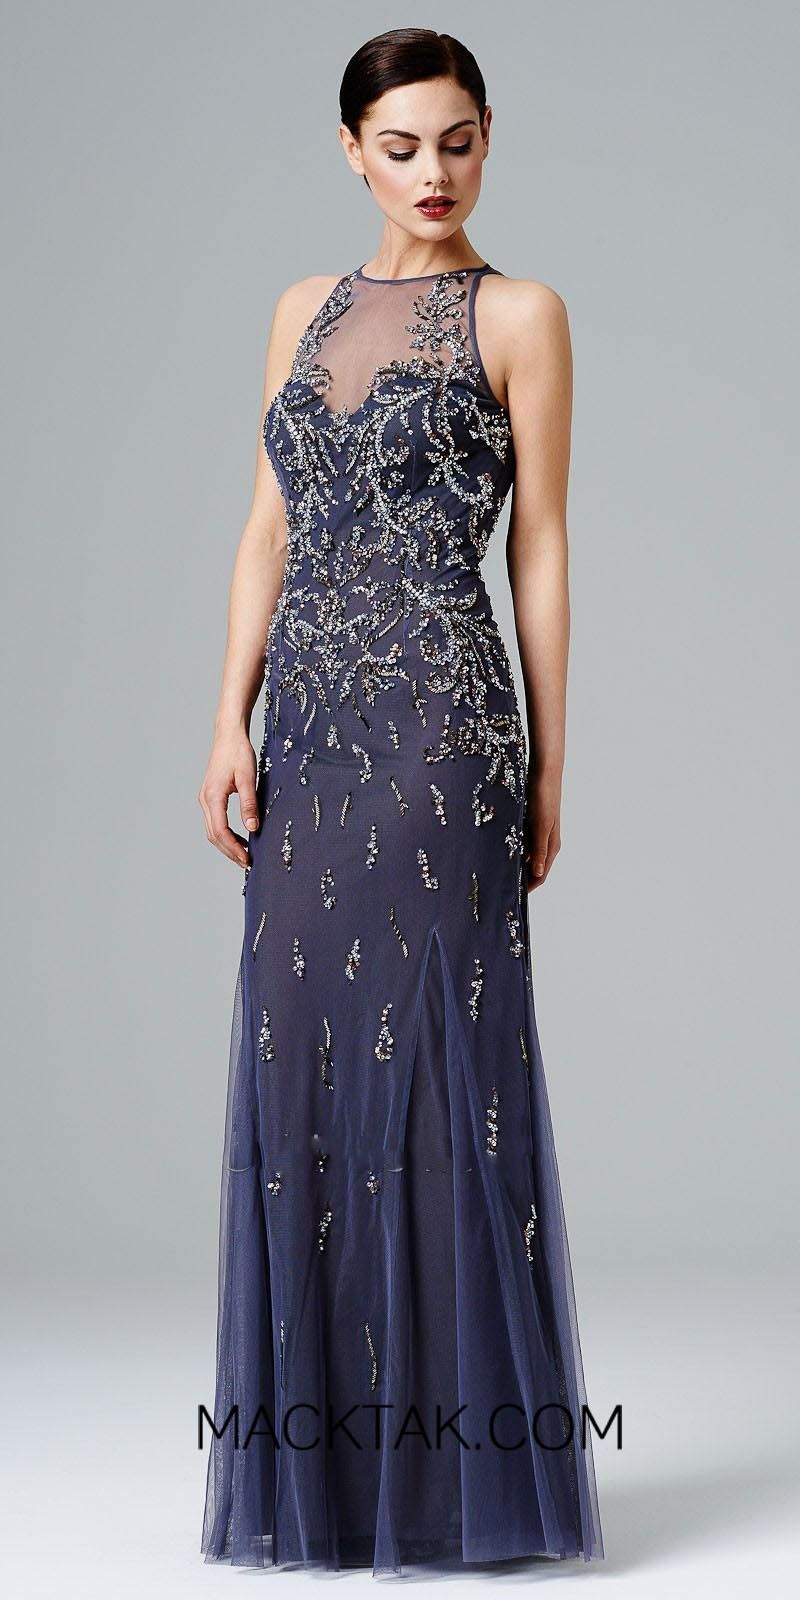 Aidan Mattox 459840 Dress   Katherine   Pinterest   Aidan mattox